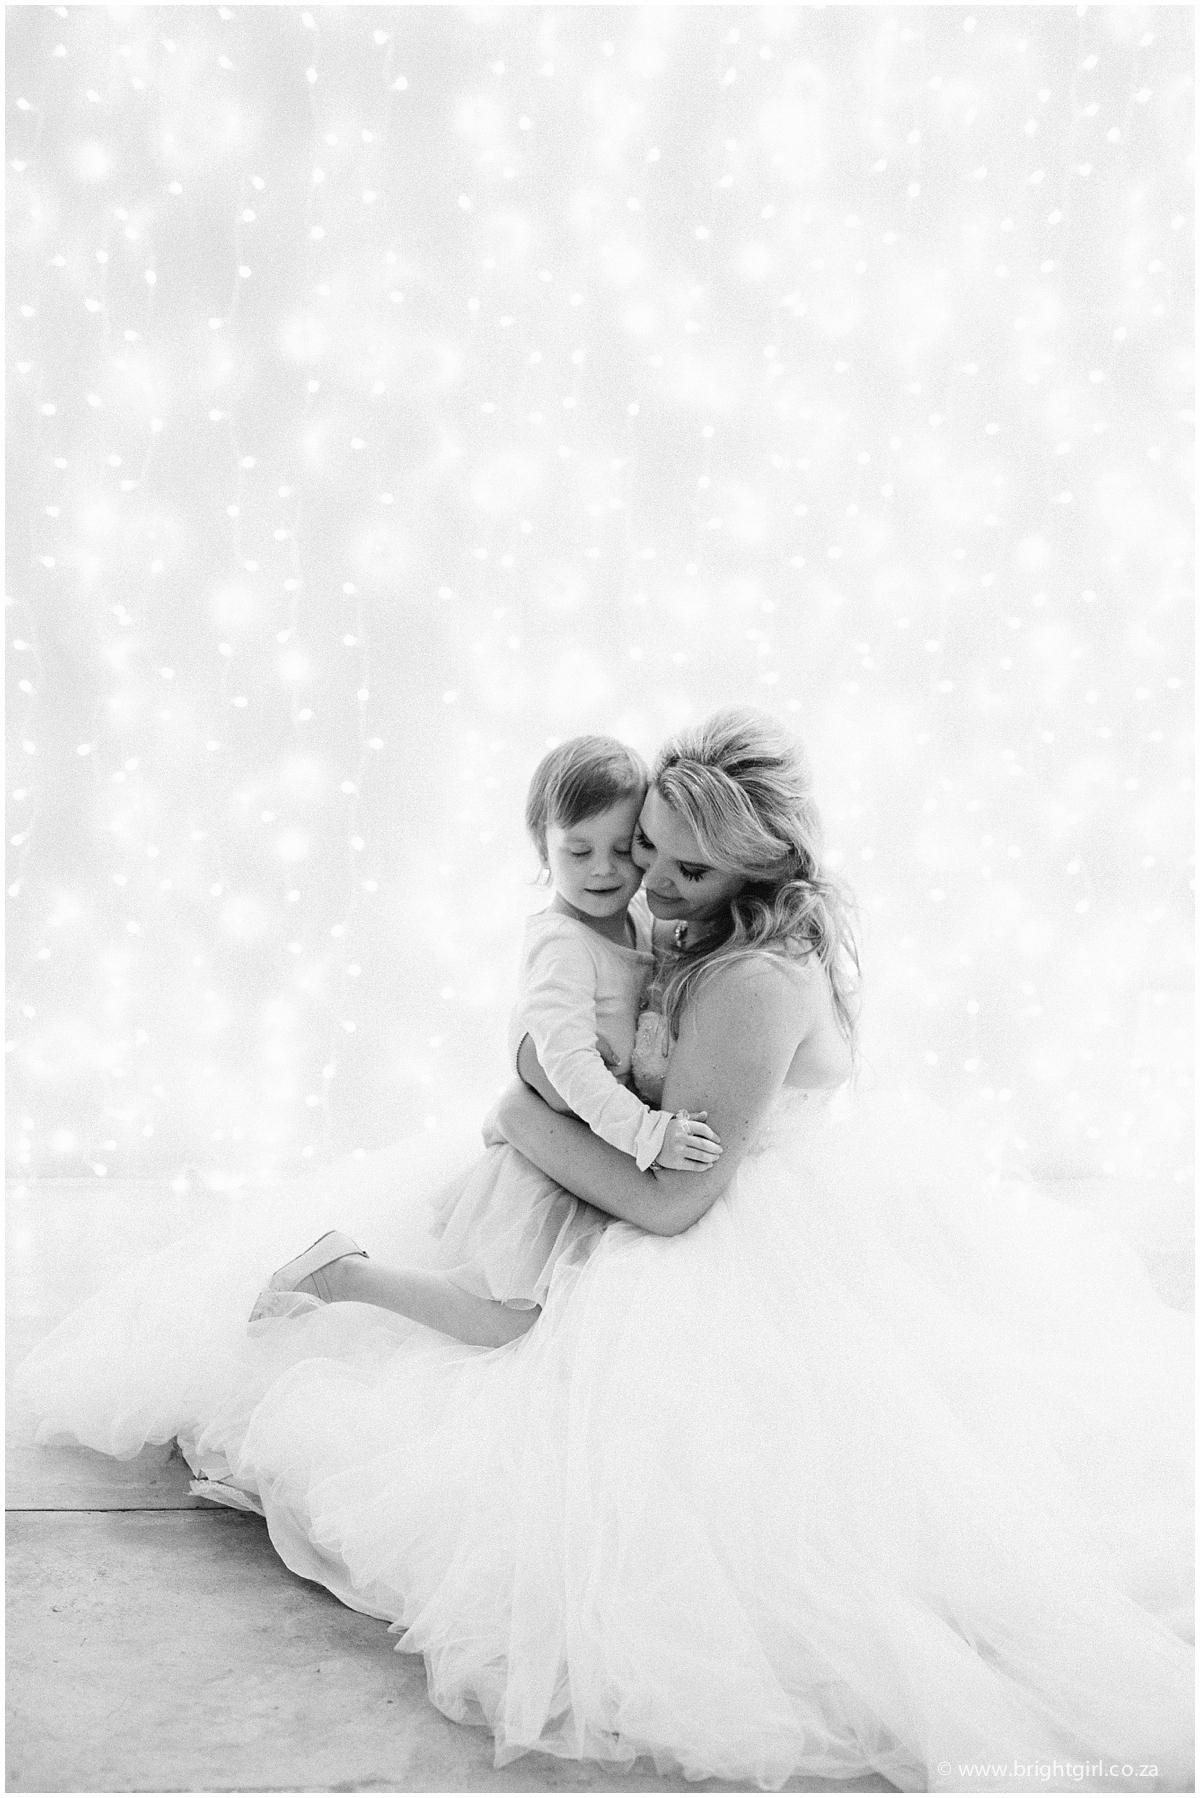 talloula-wedding-tarryn-chris-50